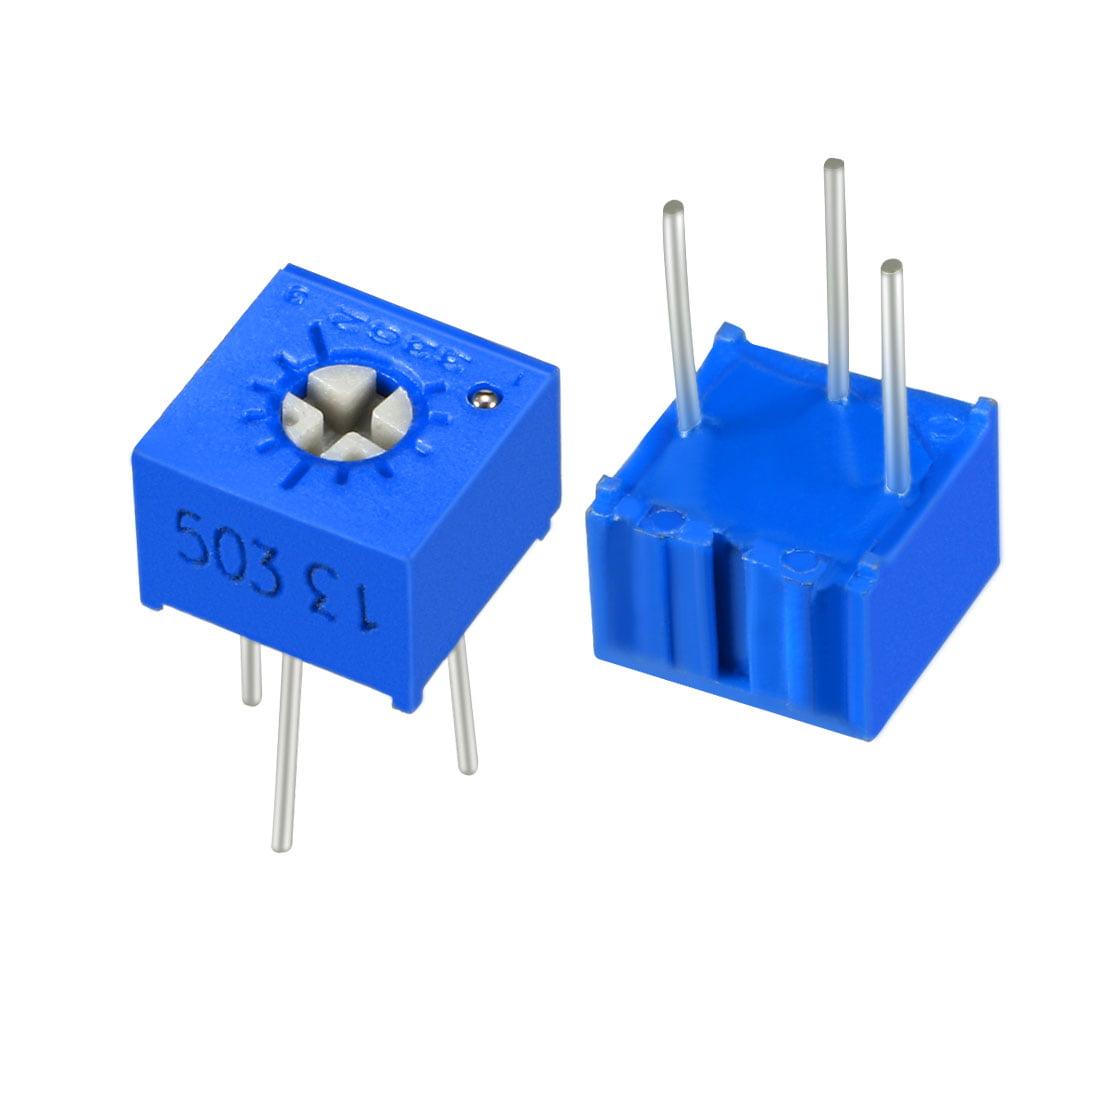 Resistors 50k Ohm Top Adjustment Horizontal Cermet Potentiometer 2 Pcs - image 6 of 6